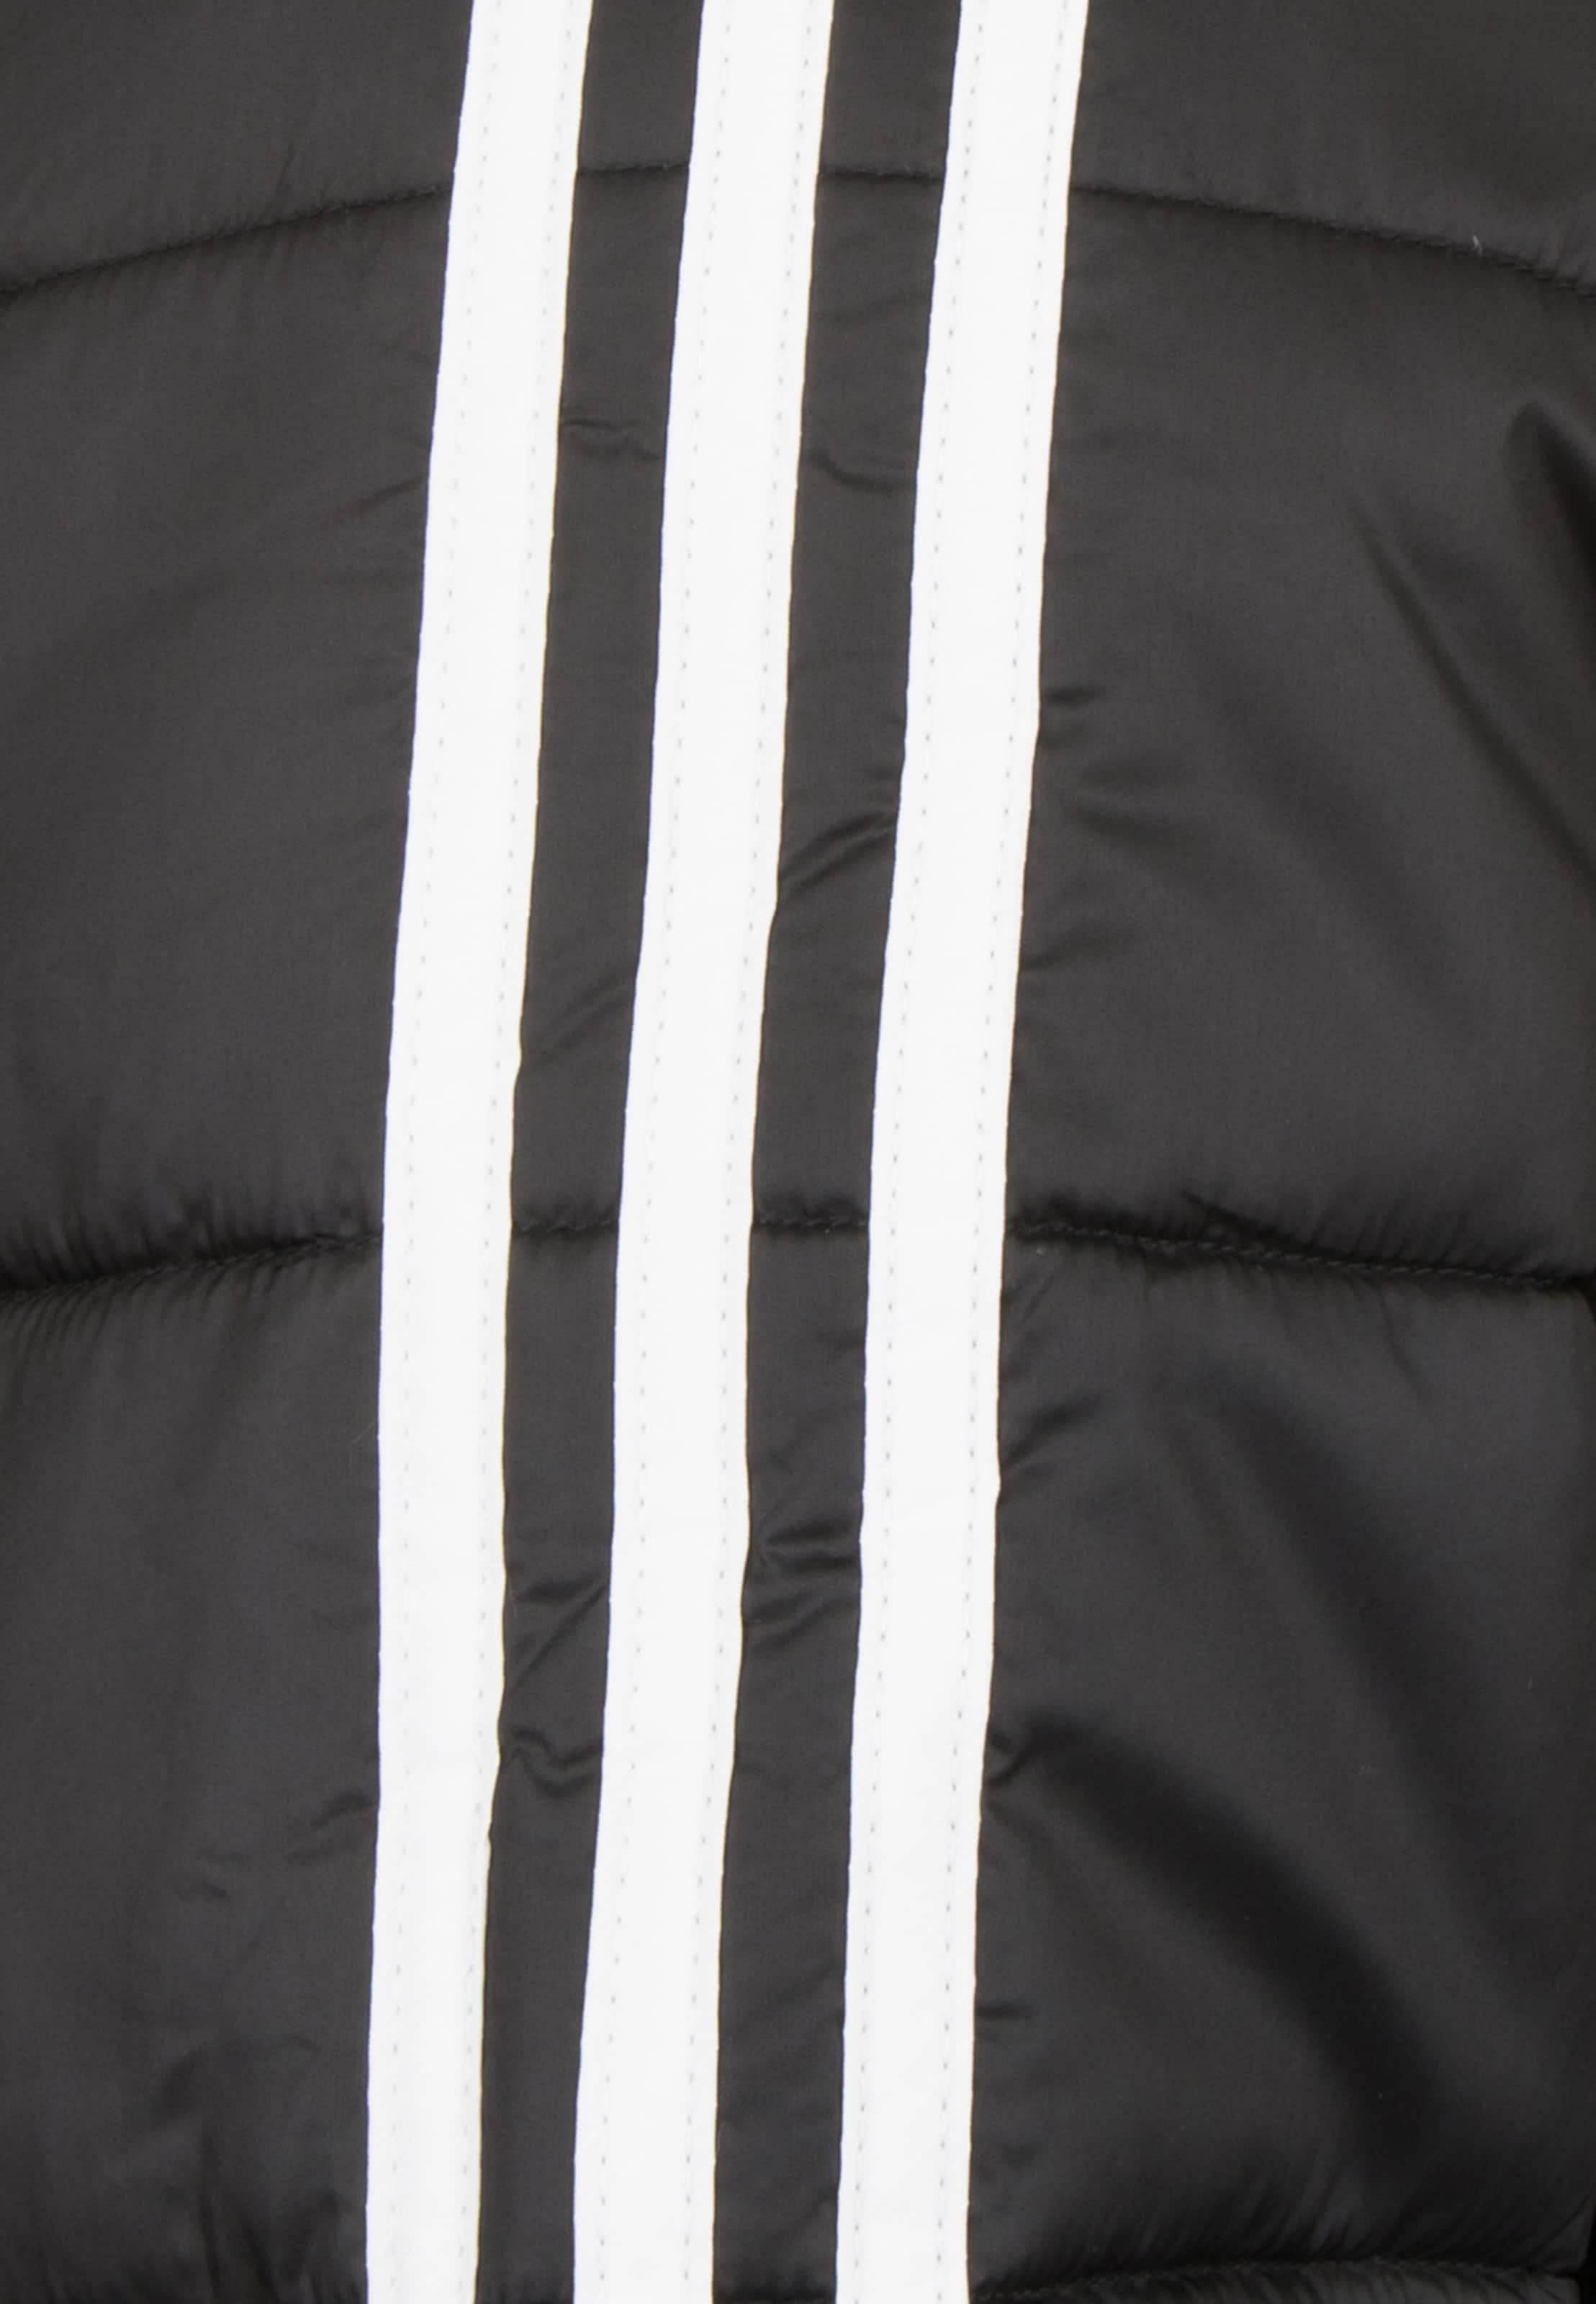 Performance Wei Turin' Adidas In ApricotSchwarz Winterjacke 'juventus AR3jL5c4q